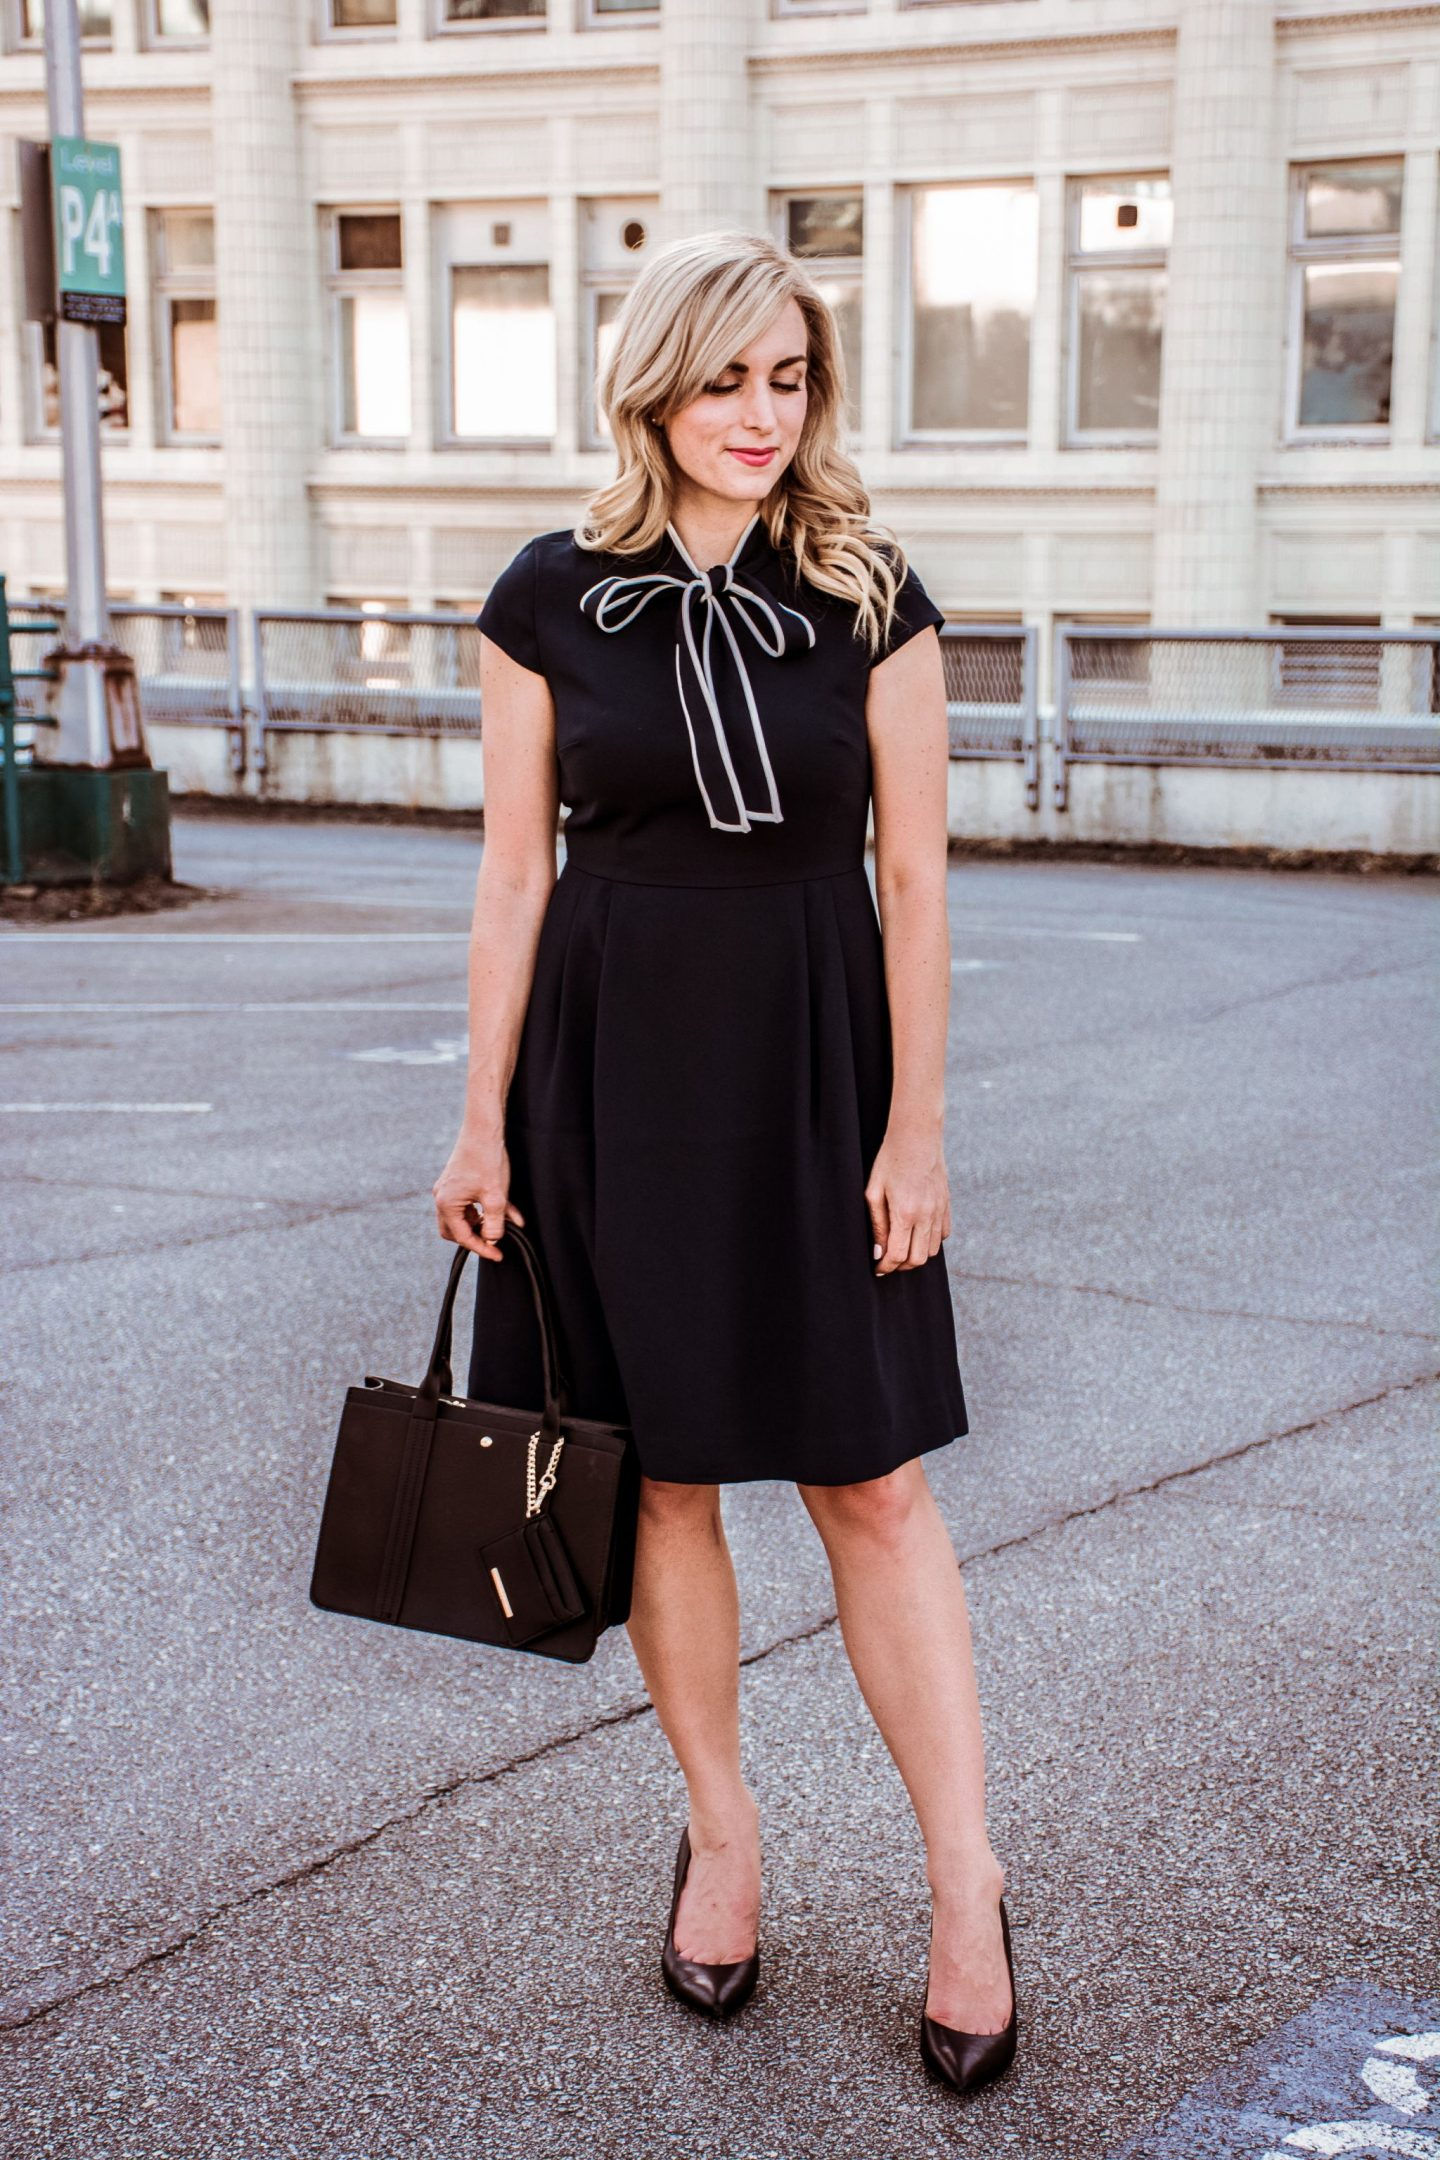 outfit idea navy tie-neck dress with black handbag